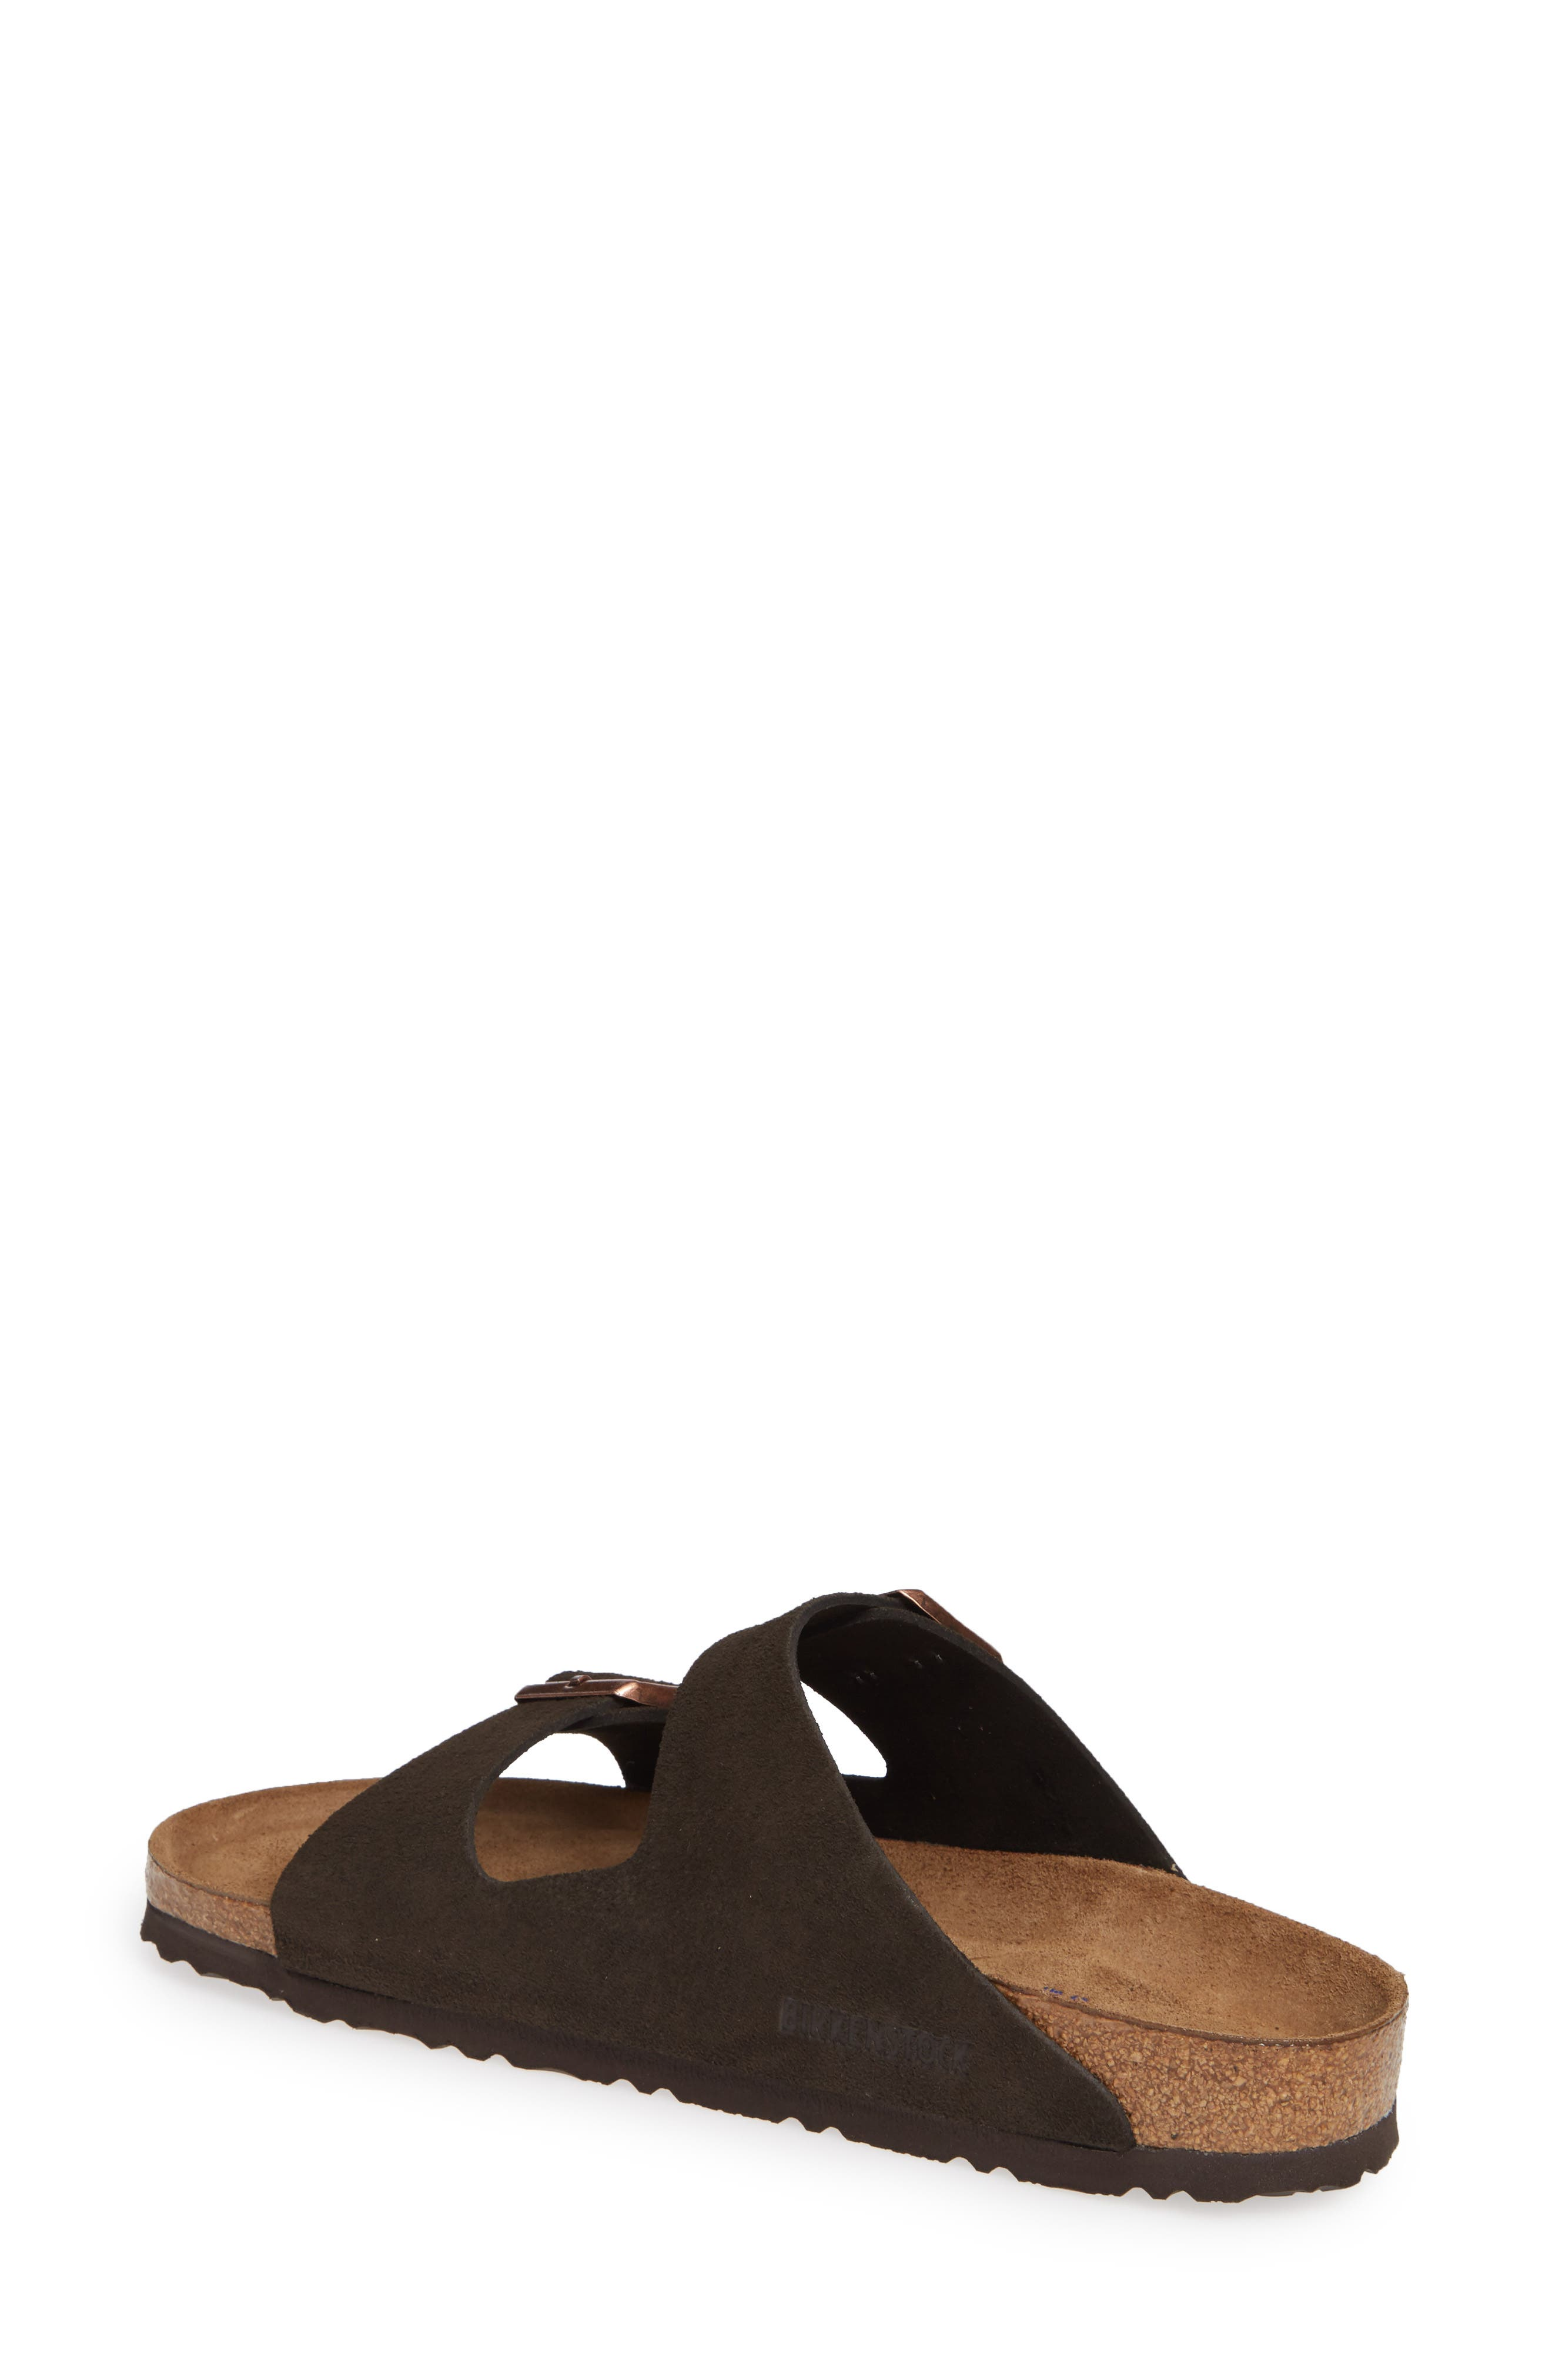 ,                             'Arizona' Soft Footbed Suede Sandal,                             Alternate thumbnail 2, color,                             MOCHA SUEDE